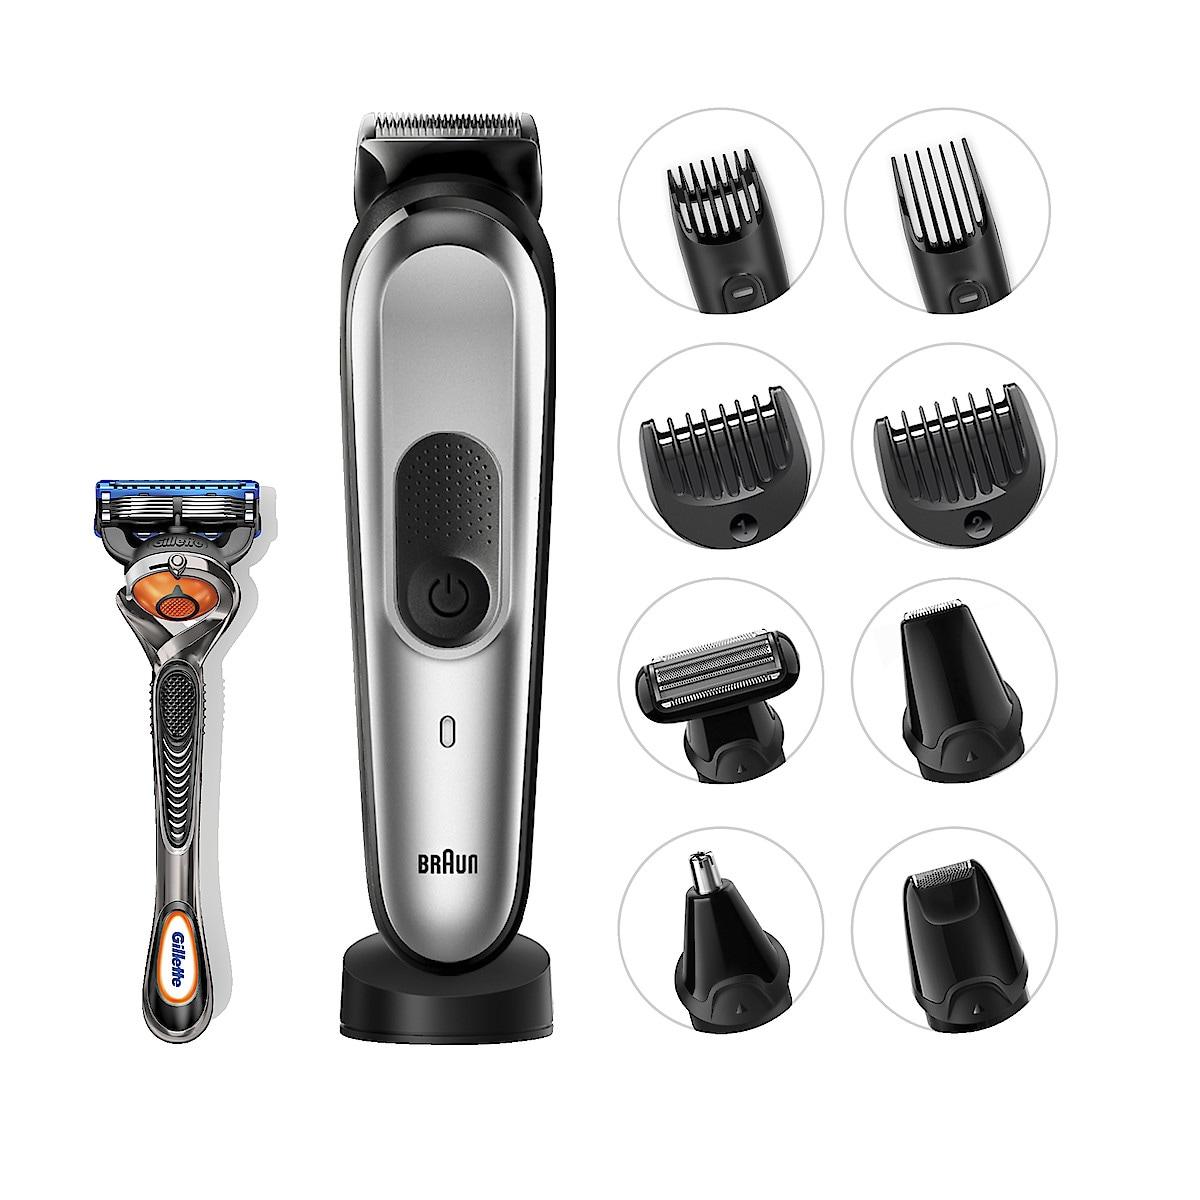 Multi-Grooming-Kit Braun MGK7021 All-in-One